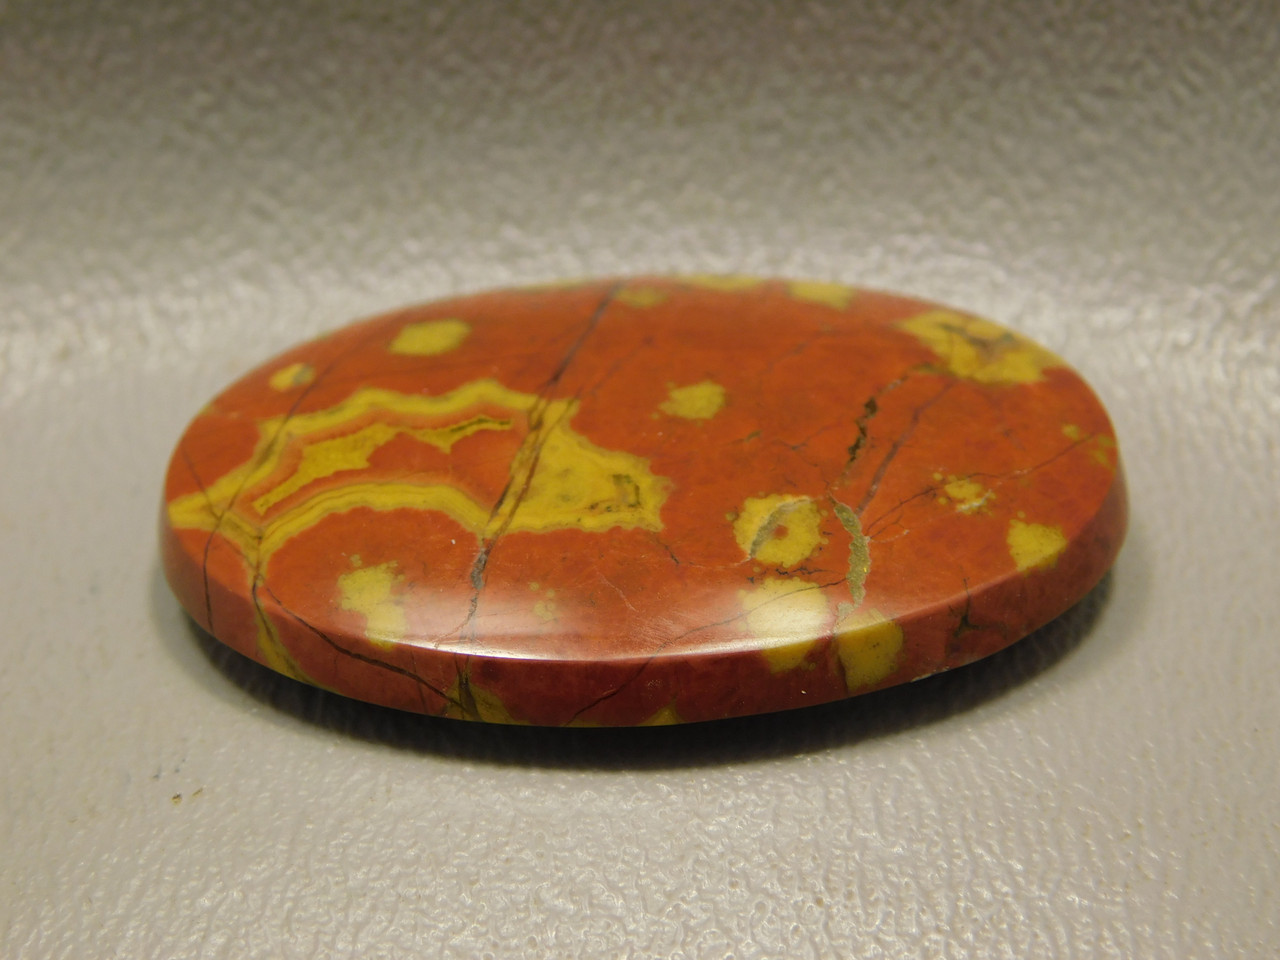 Morgan Hill Poppy Jasper Orbicular Stone Cabochon California #2